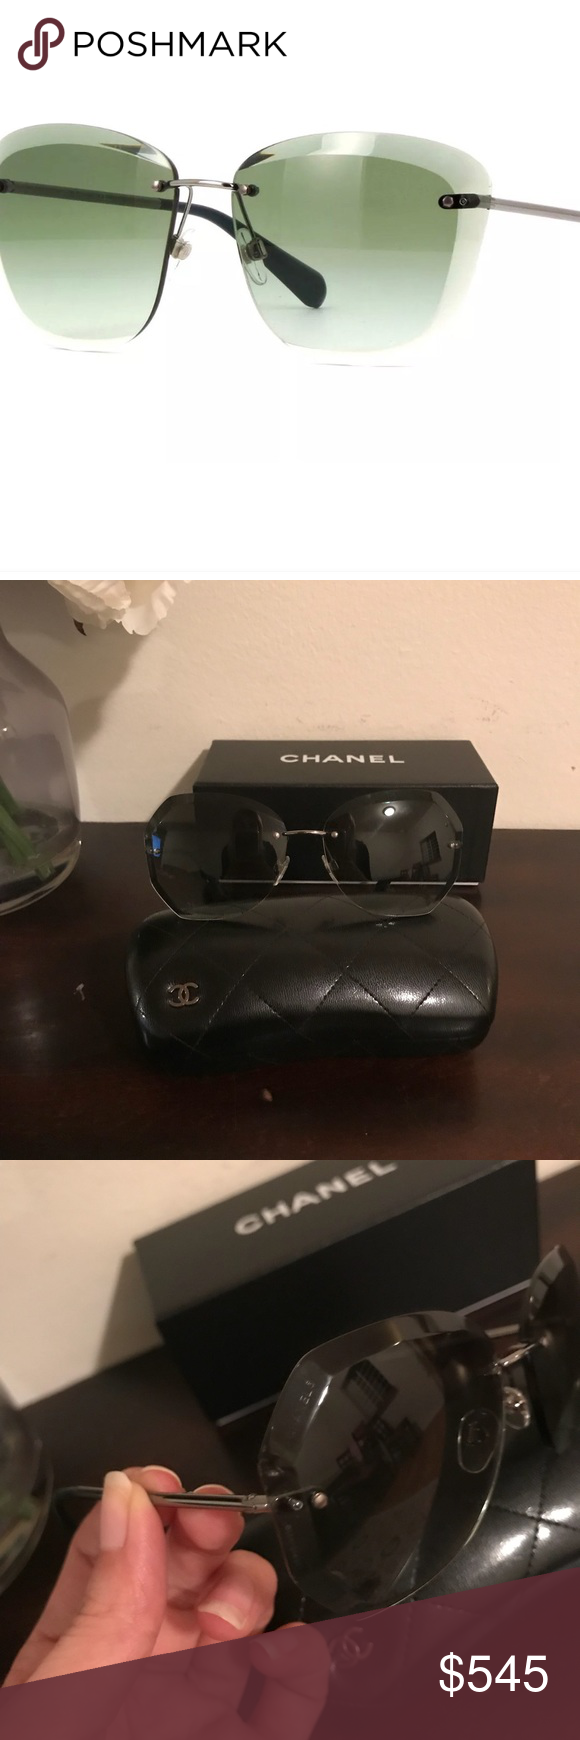 9f45647f5b8 Authentic Chanel 4221 c.108 3M Butterfly Sunglasse Frame Colour Gunmetal  Lens Colour Green